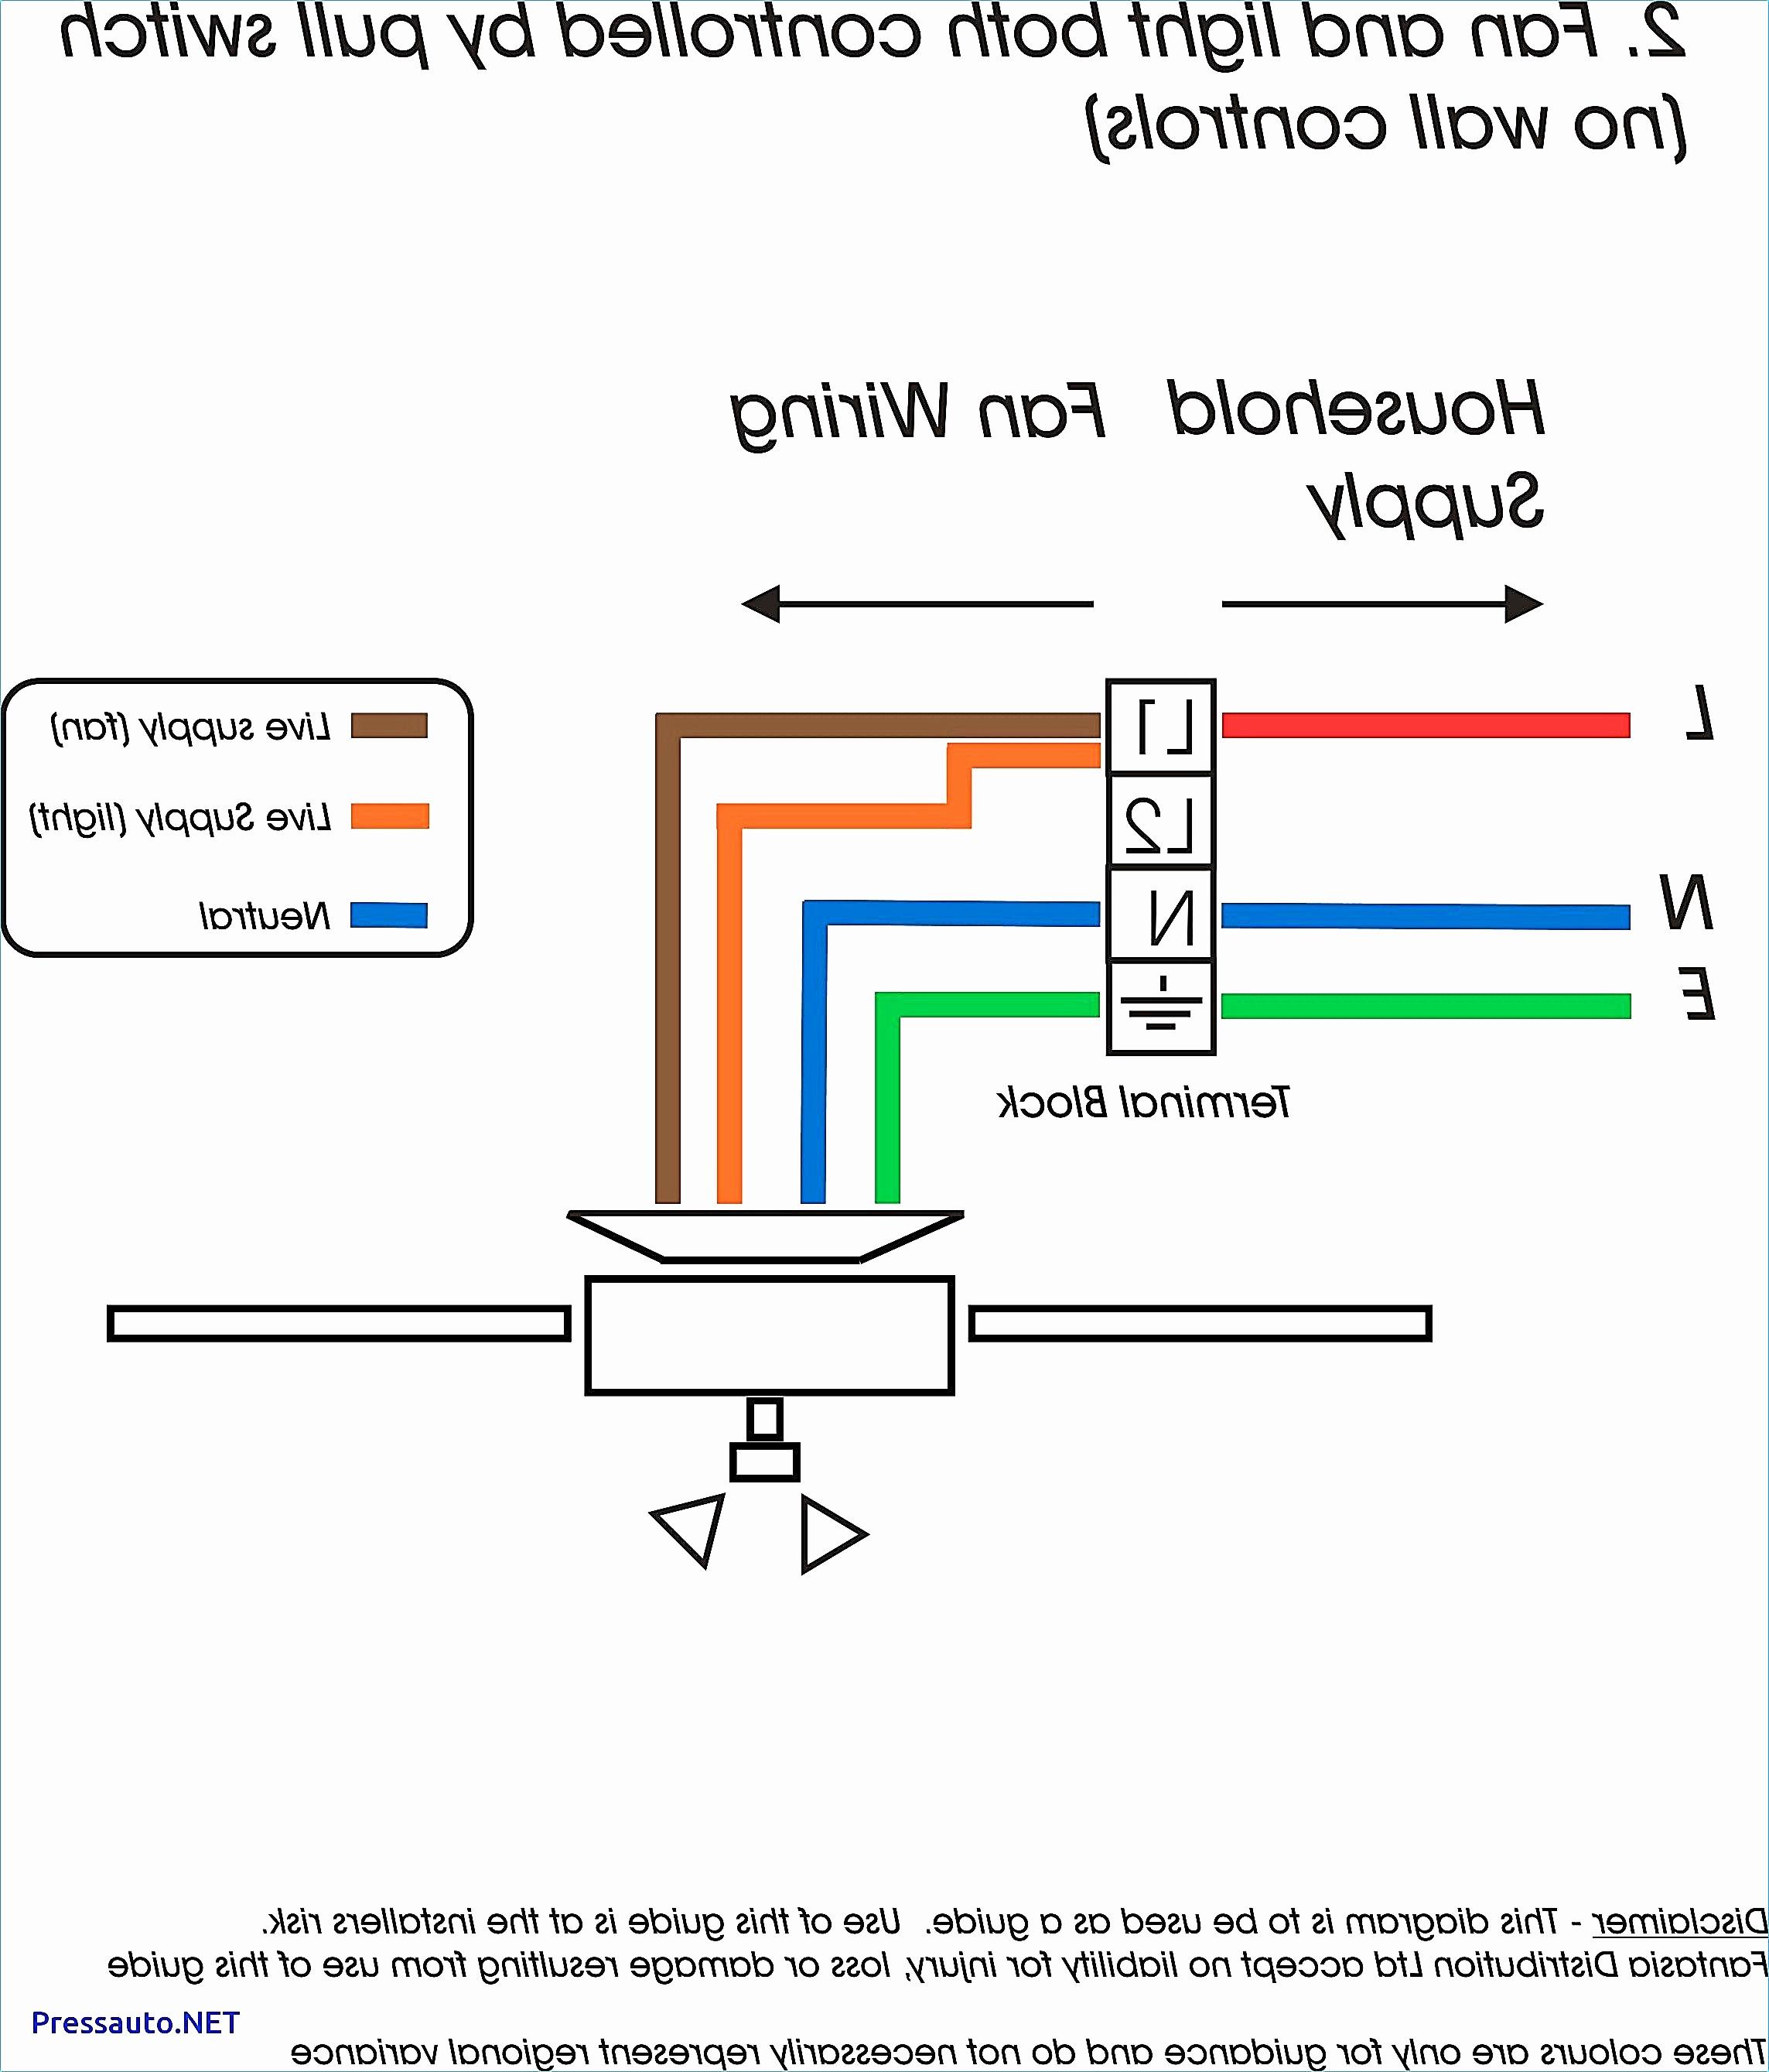 rca to rj45 wiring diagram Download-cat 5 wall jack wiring diagram Collection Rj45 Wall Socket Wiring Diagram Australia Best Belkin 17-b